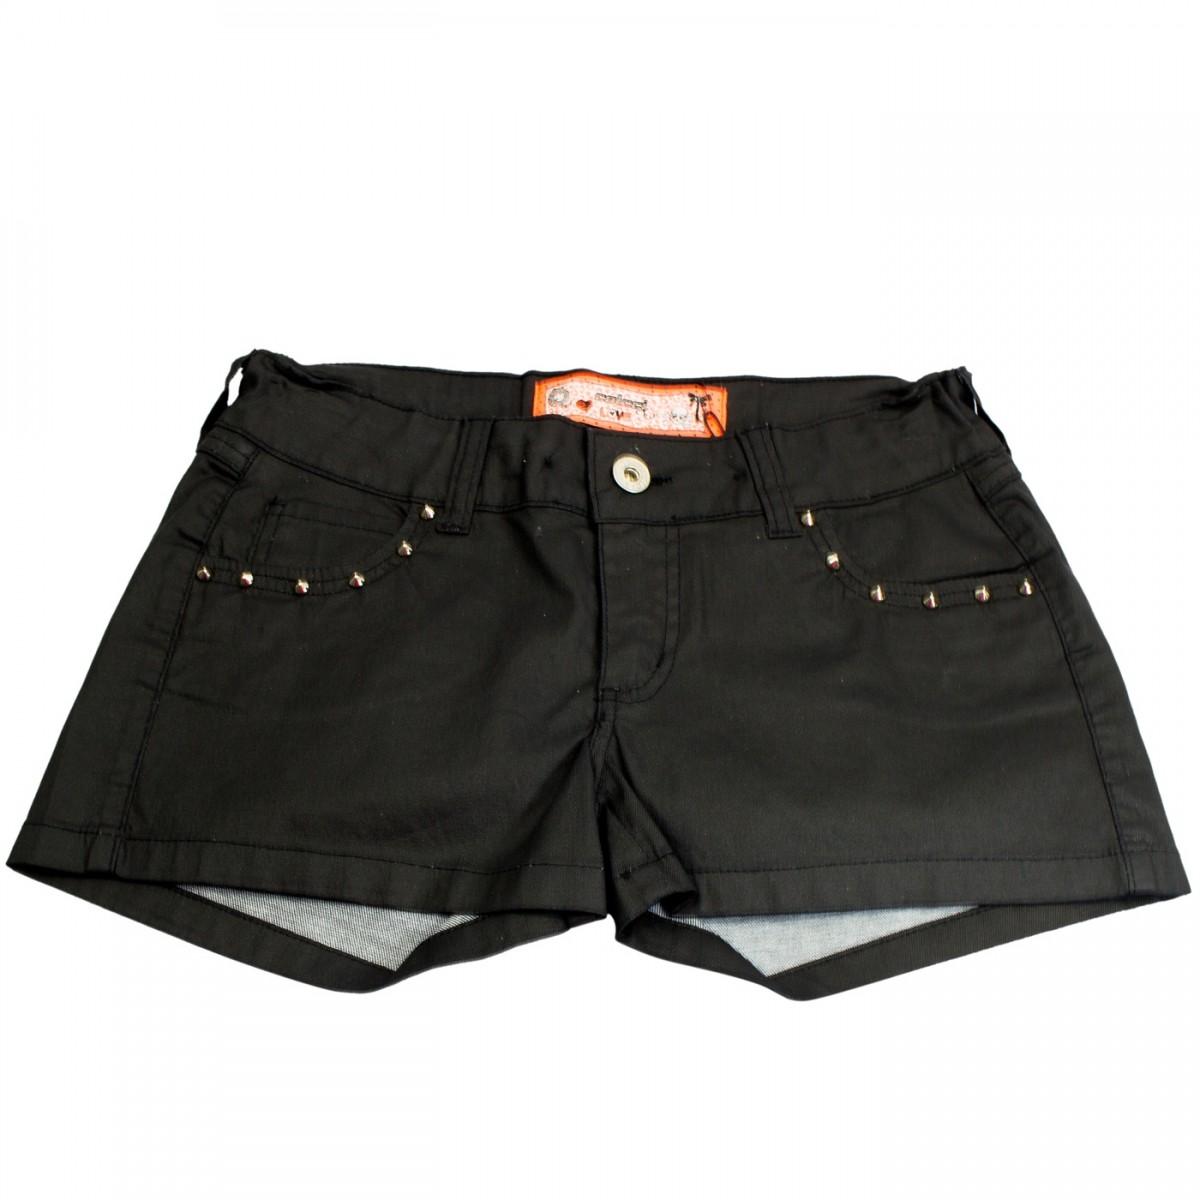 Shorts Juvenil Colcci Fun Indigo 006.01.01296 Preto